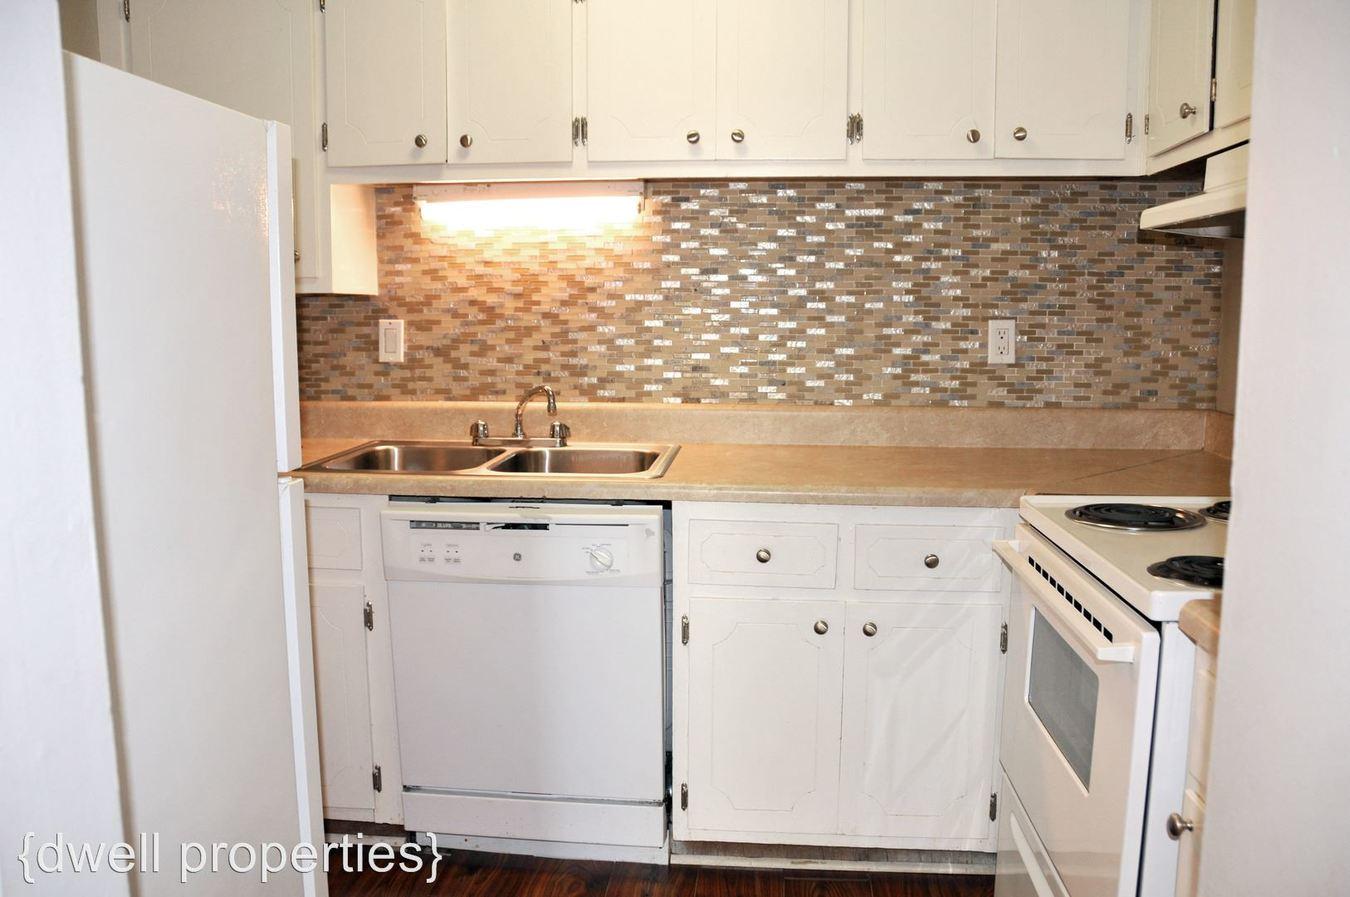 2 Bedrooms 1 Bathroom Apartment for rent at 282910th Avenue South in Birmingham, AL